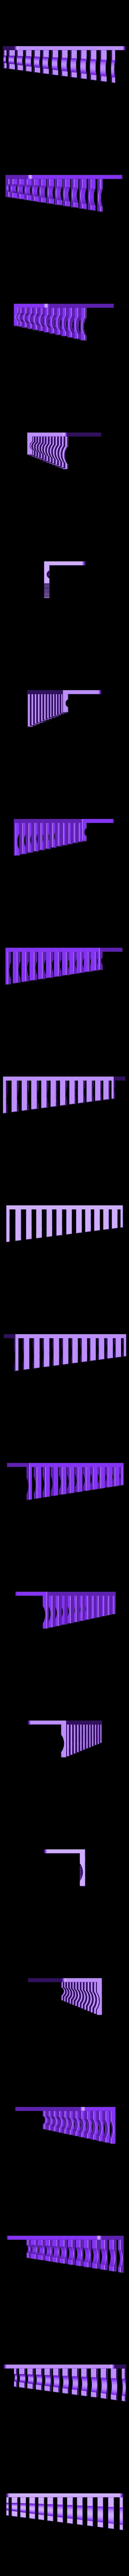 Screws.stl Download free STL file Combination Spanner Set 12pcs metric 6-22mm Wall Holder 056 I for screws or peg board • 3D print design, Wiesemann1893